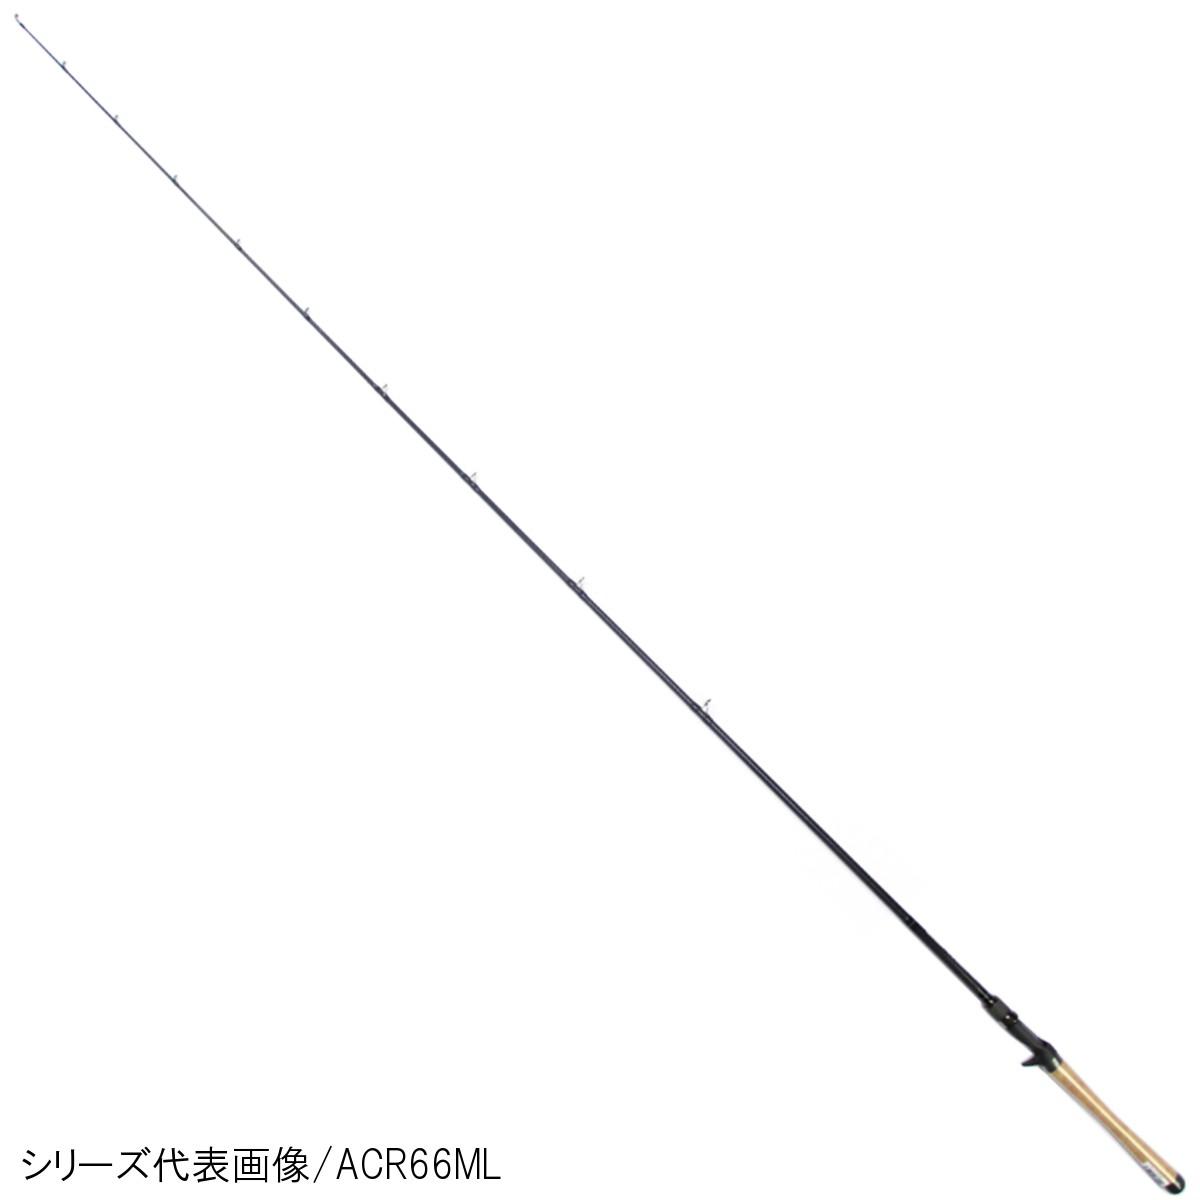 J Custom 2.0 アドバンスト・クランキング・ロッド ACR69M【大型商品】